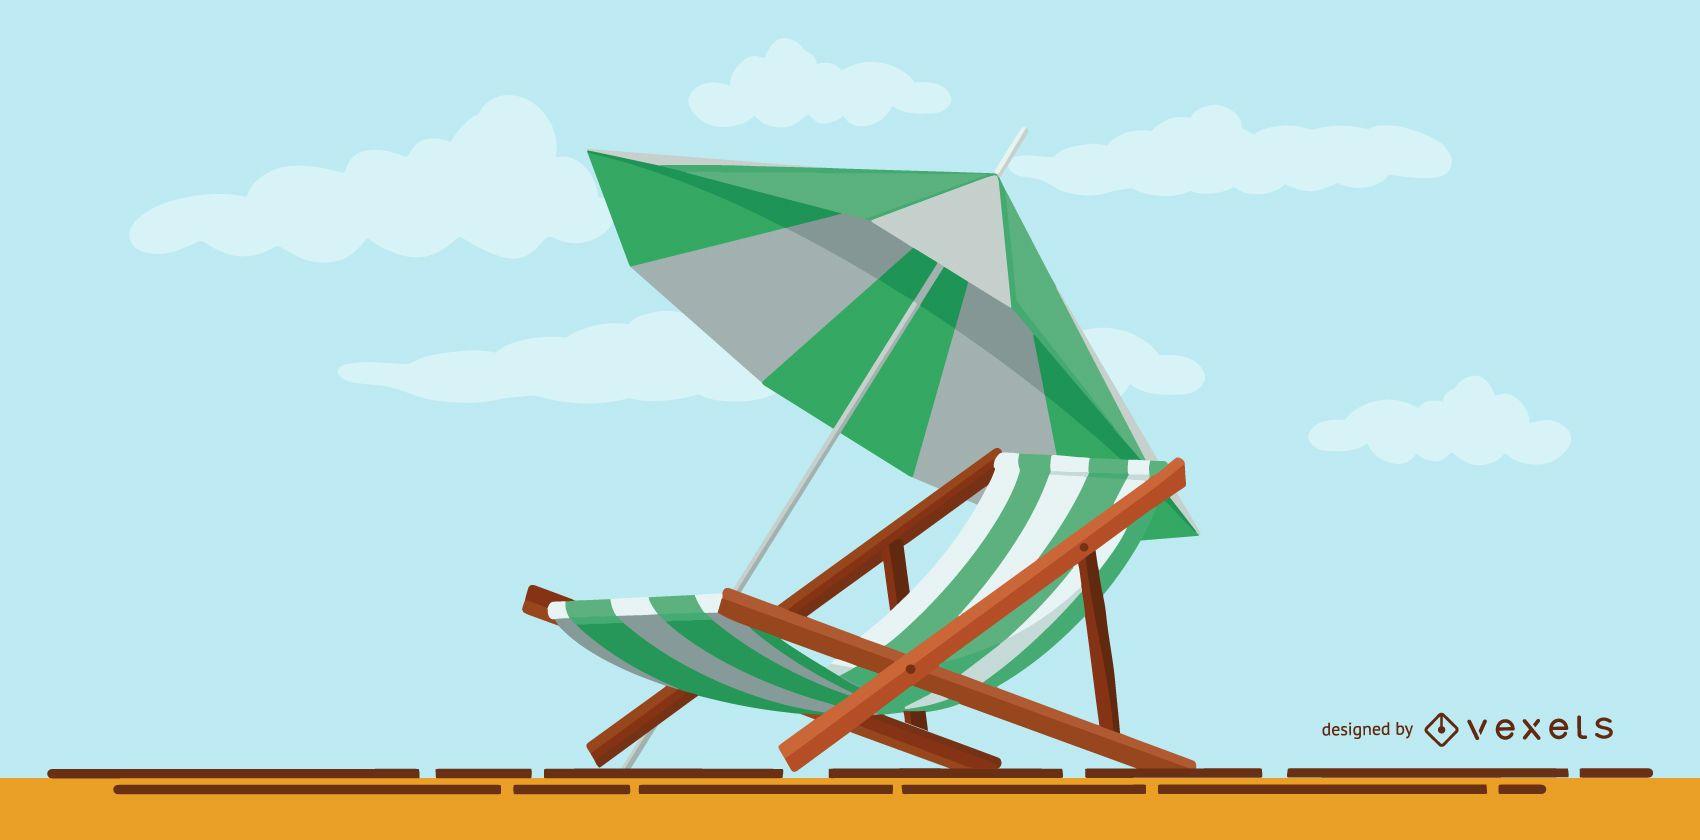 Summer Umbrella Illustration Design